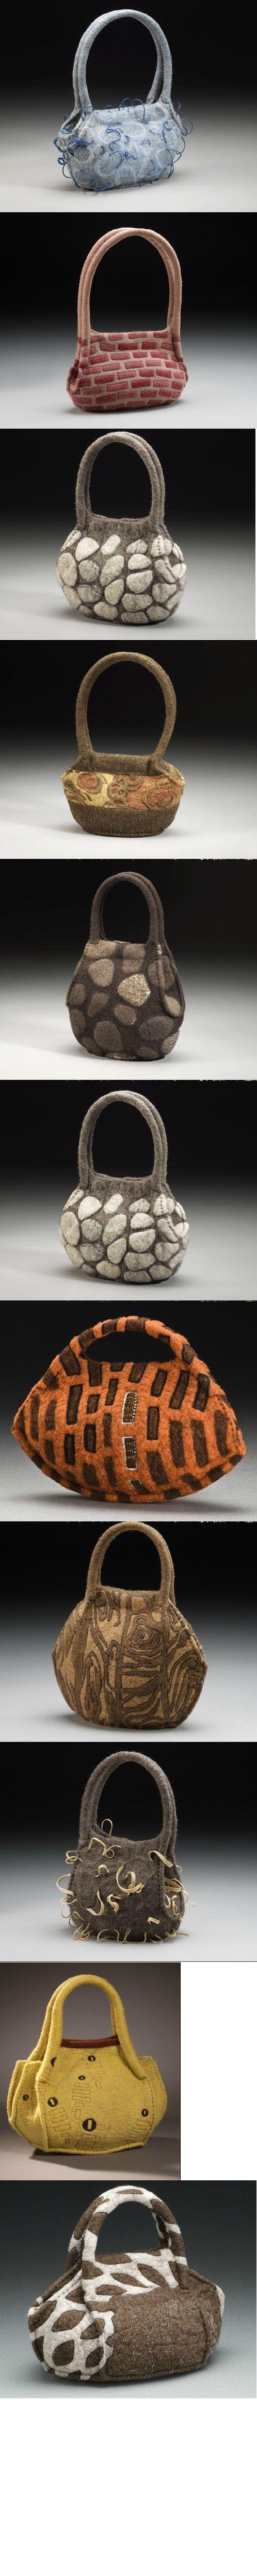 http://www.strongfelt.com/  Lisa Klakulak's creativity